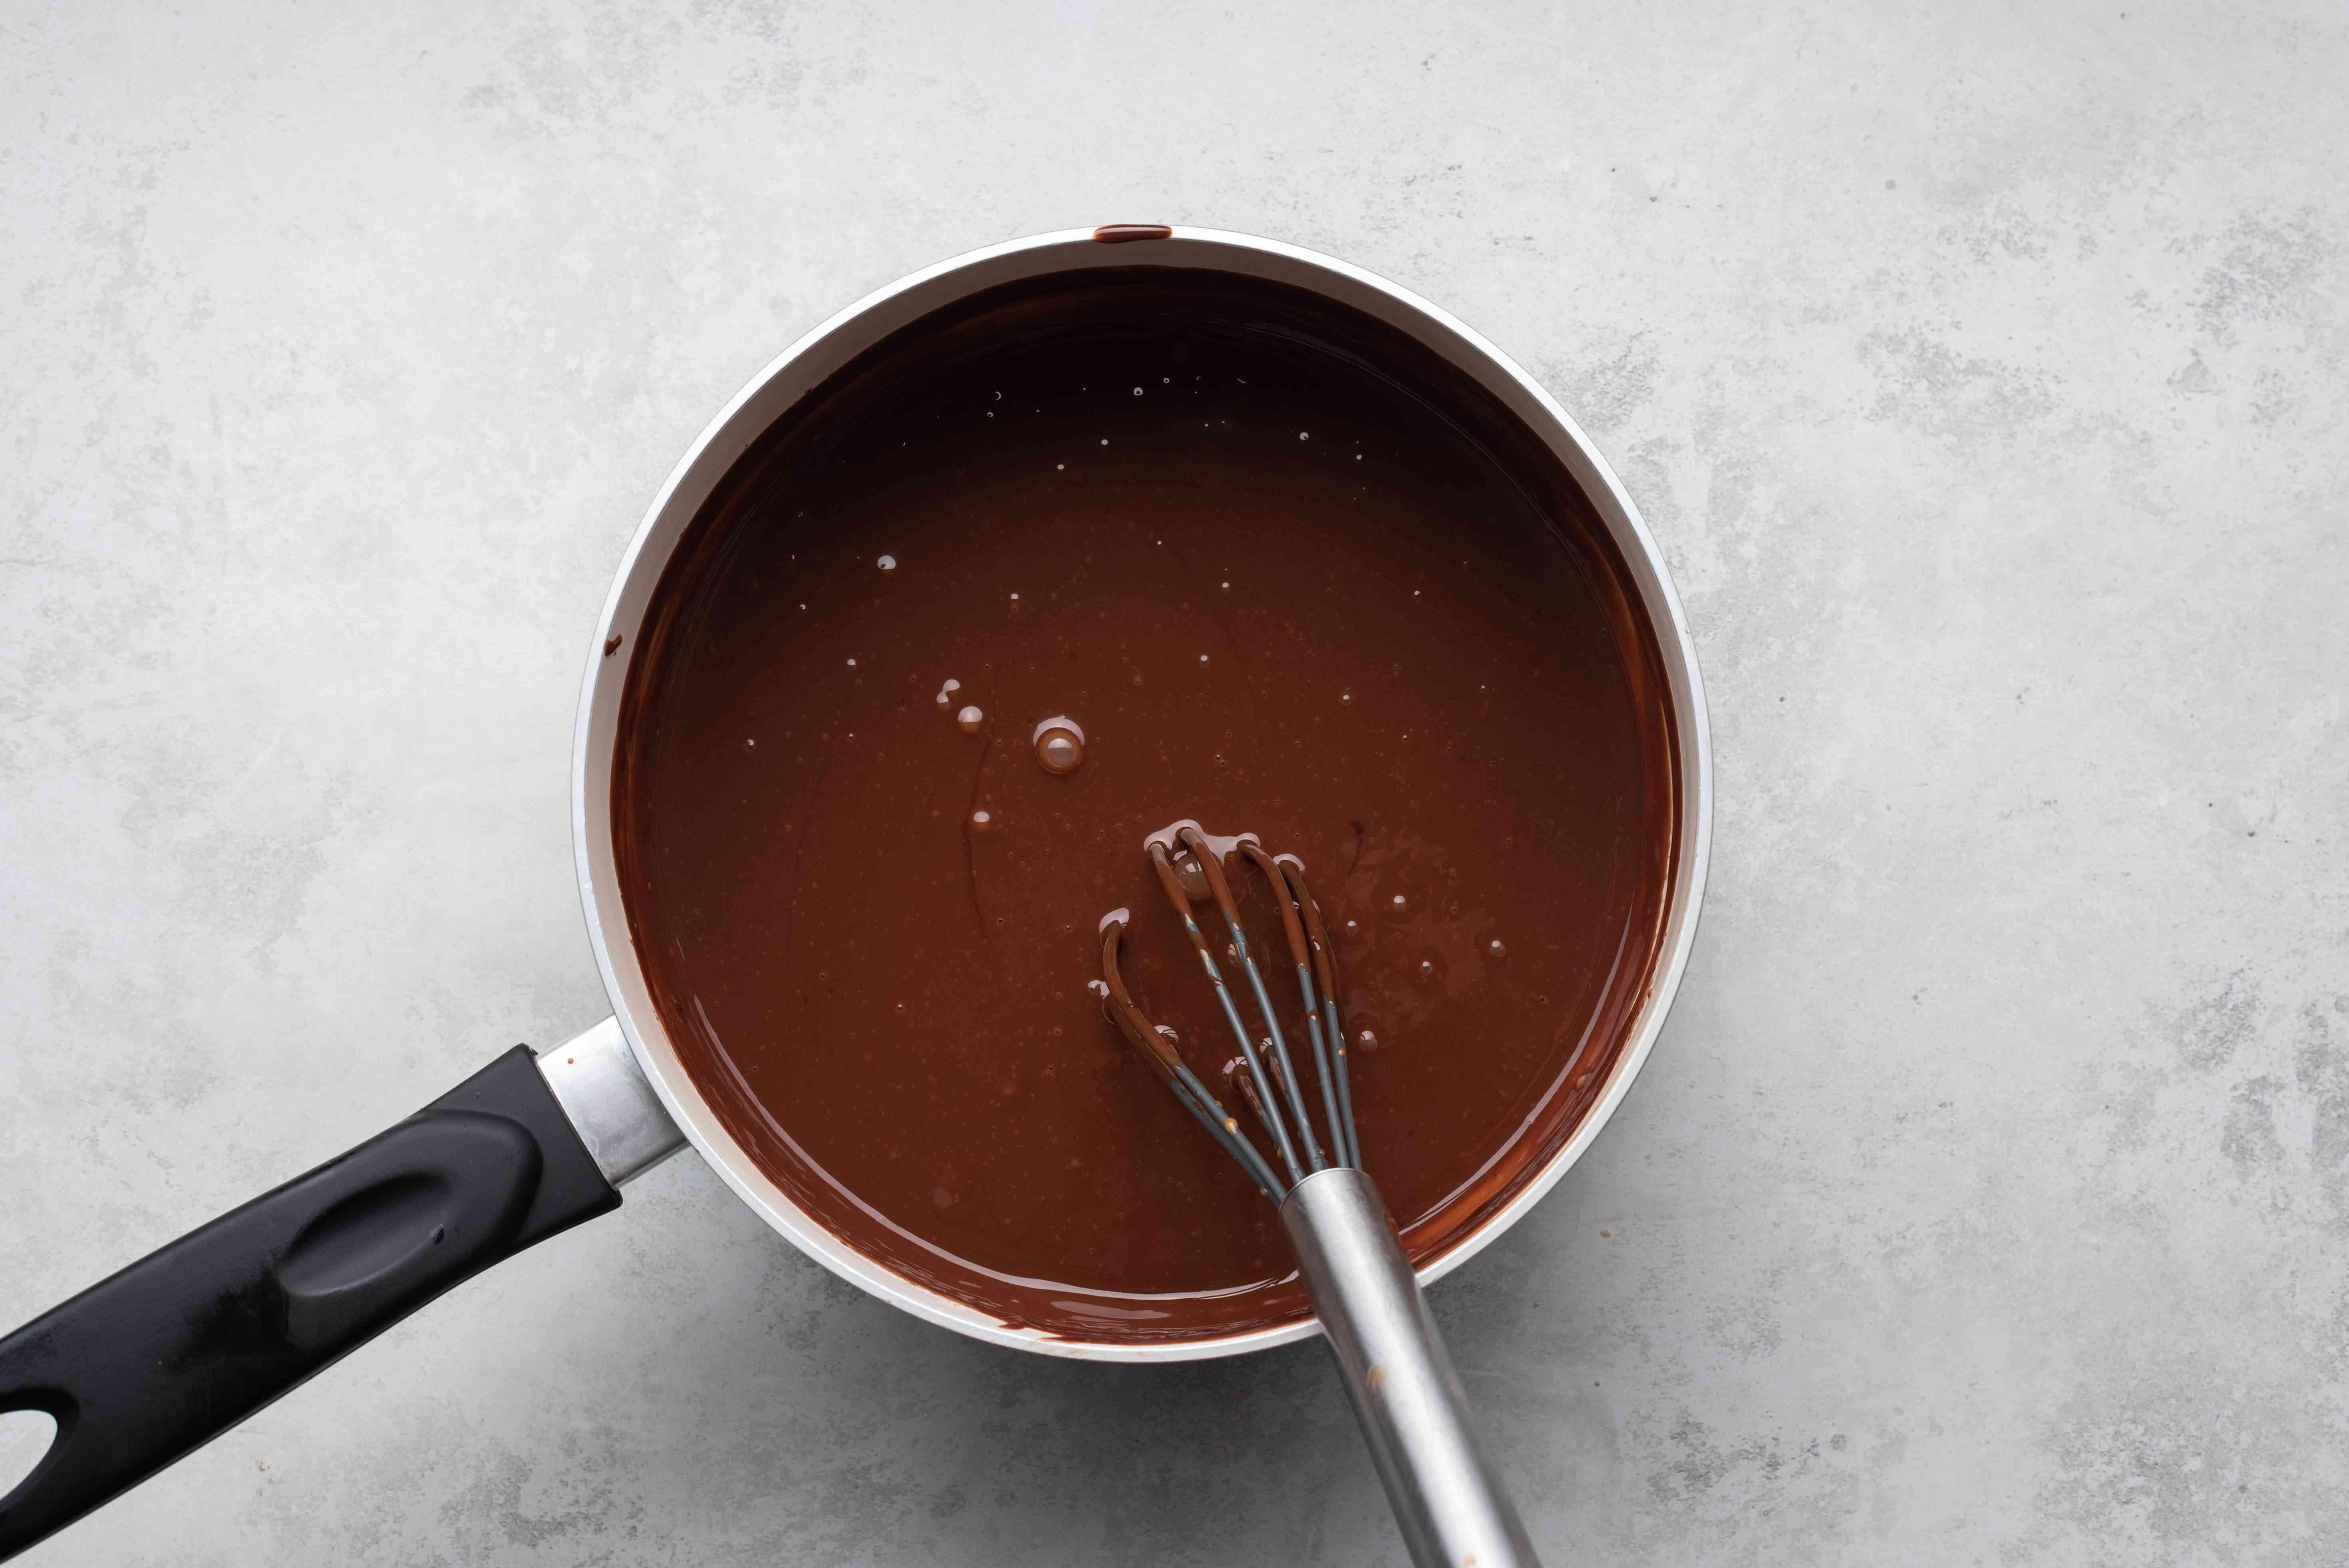 chocolate mixture in a saucepan